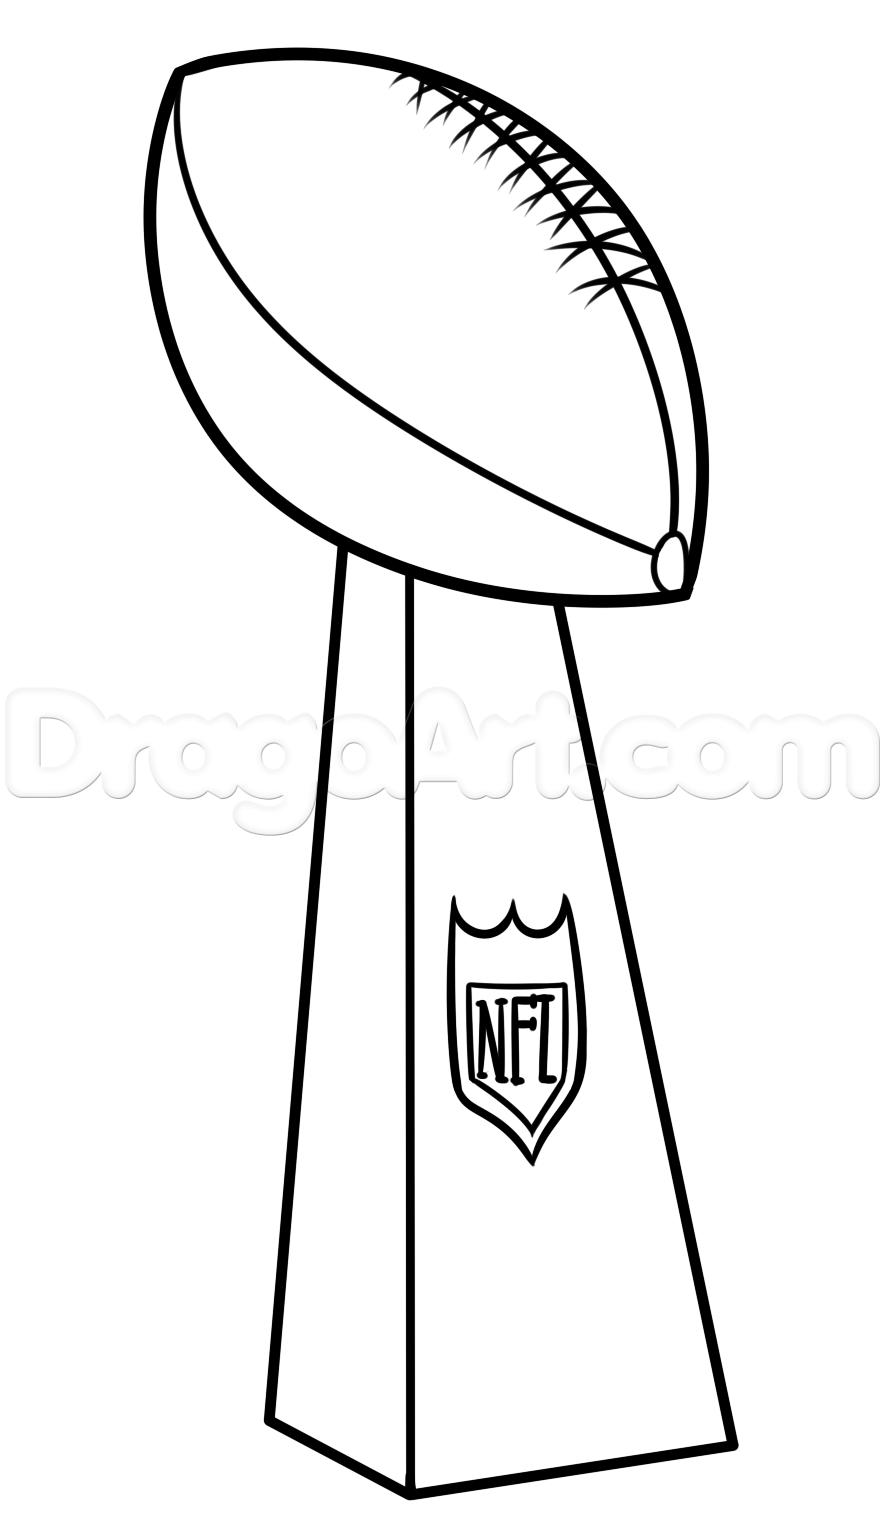 885x1521 Super Bowl Vince Lombardi Trophy Coloring Page